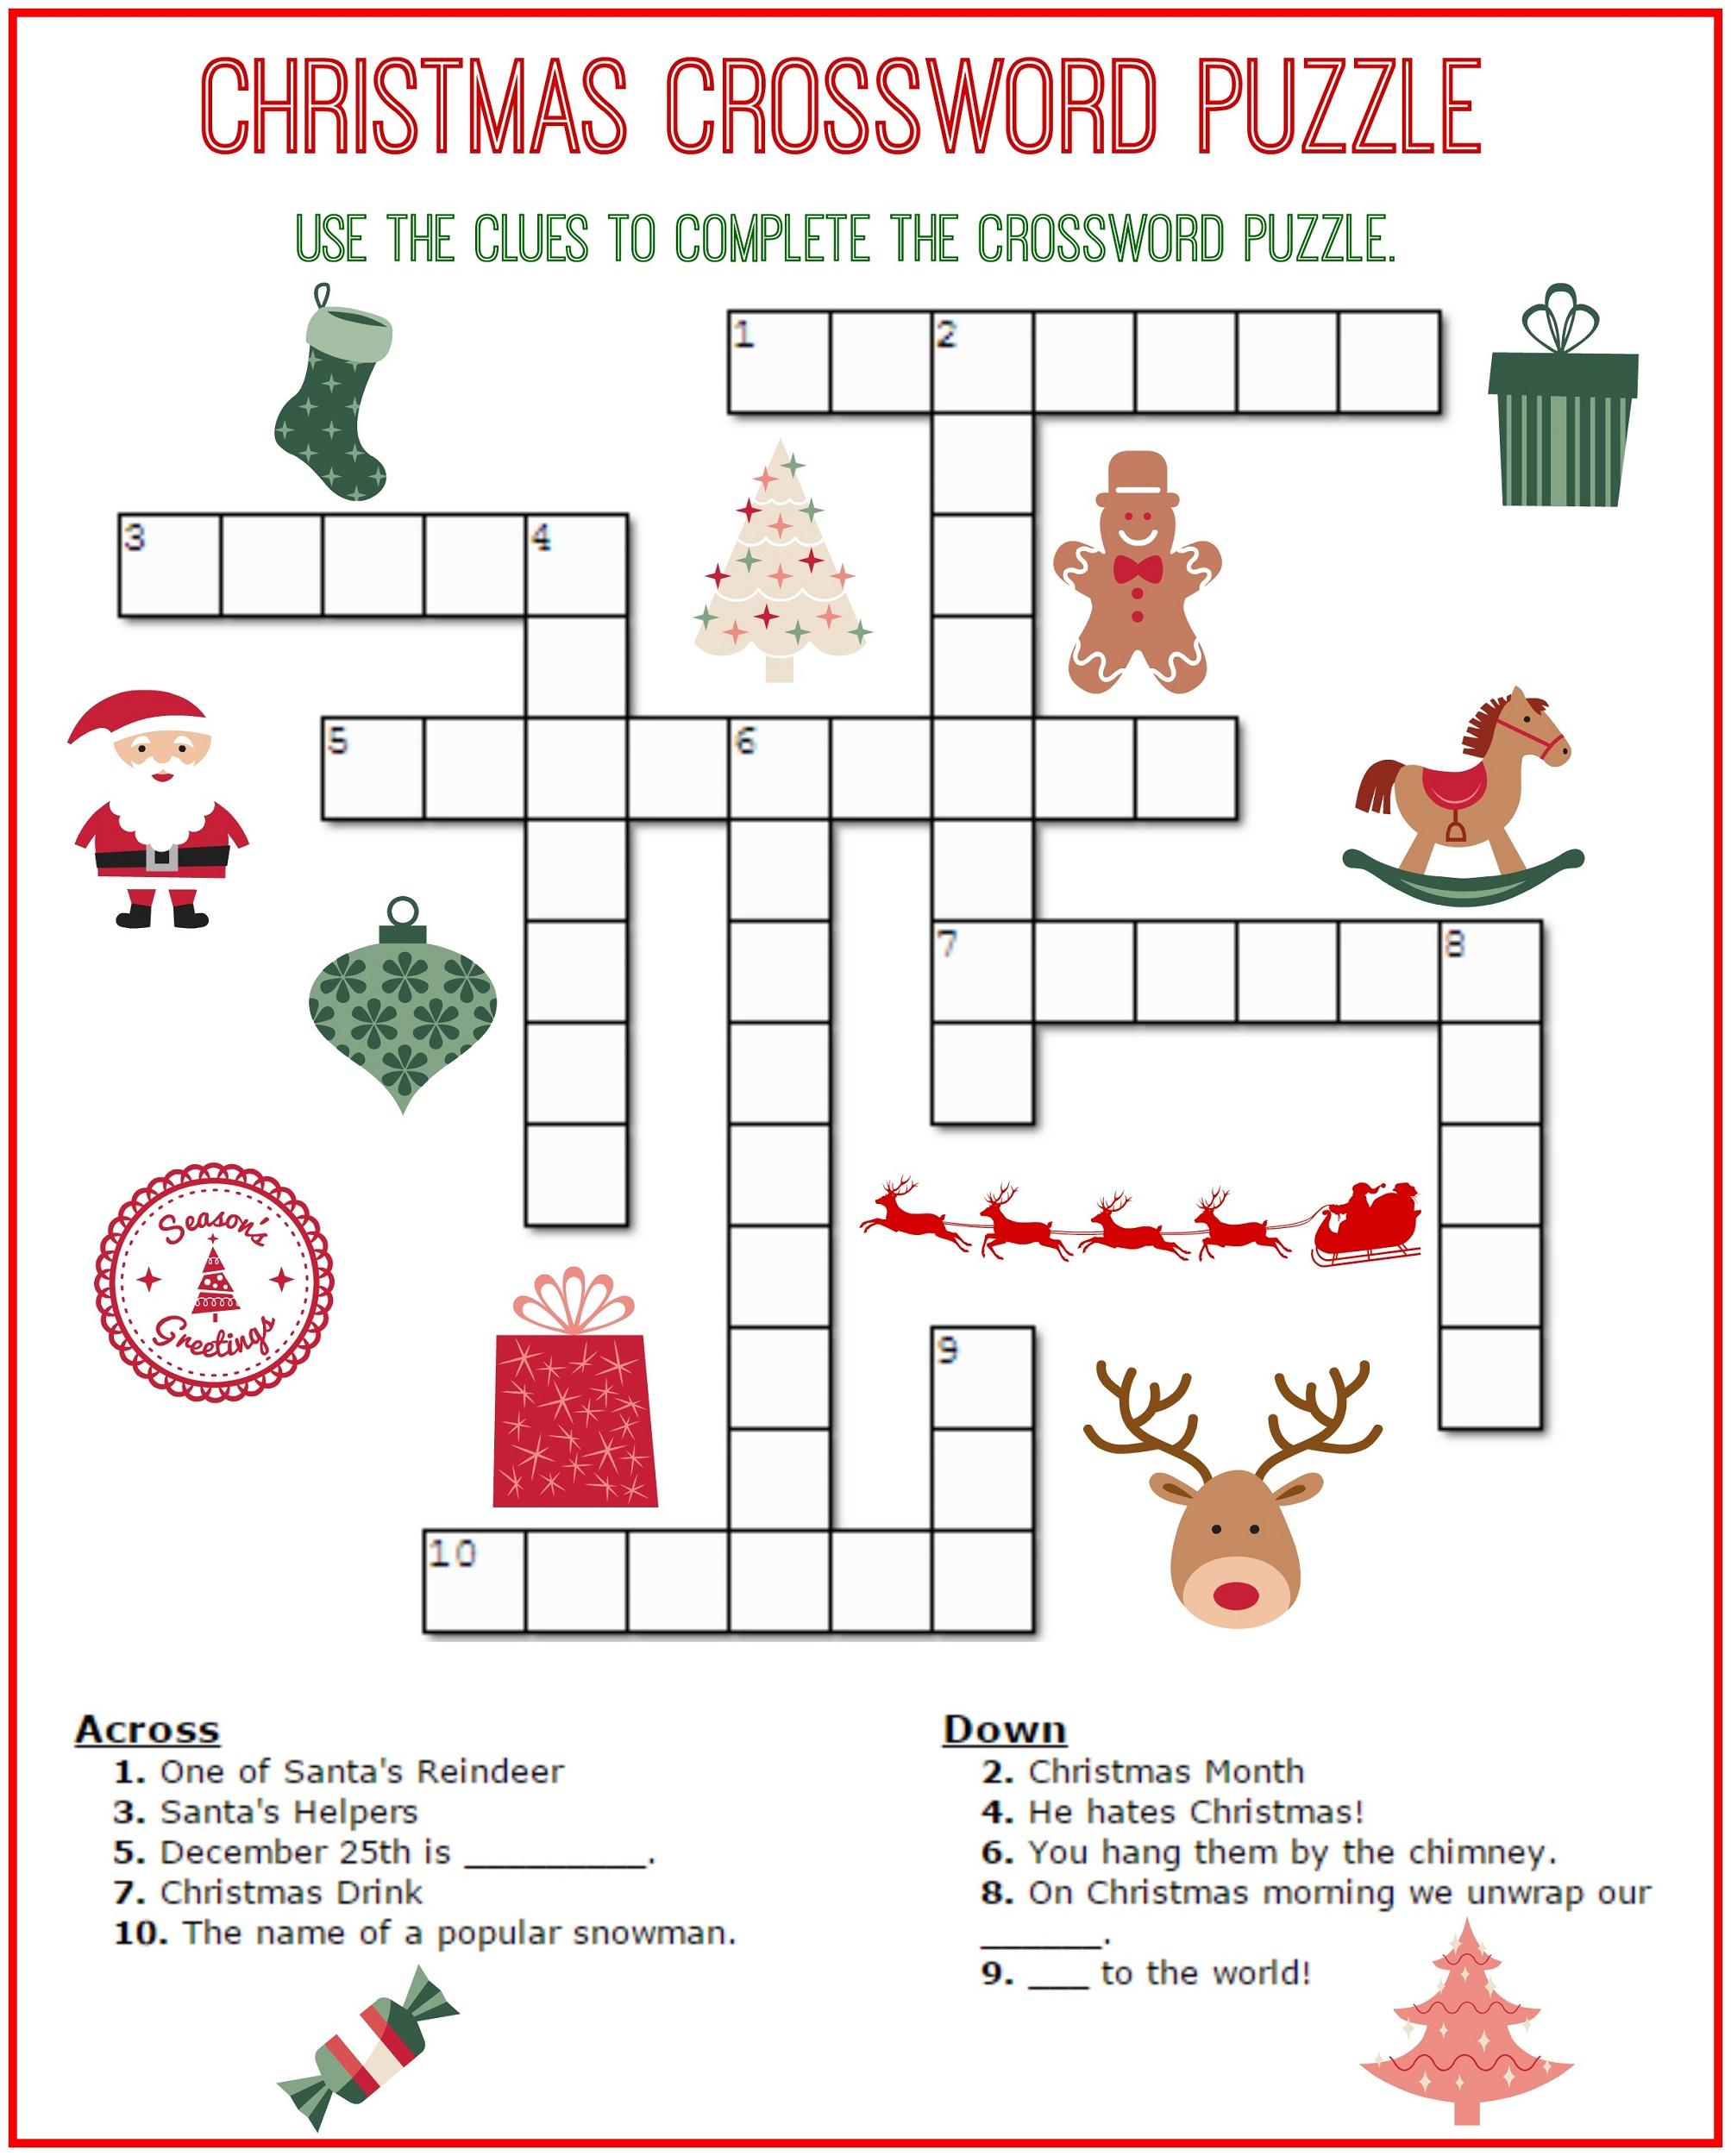 Crossword Puzzle Kids Printable 2017 | Kiddo Shelter - Printable Children's Crossword Puzzles